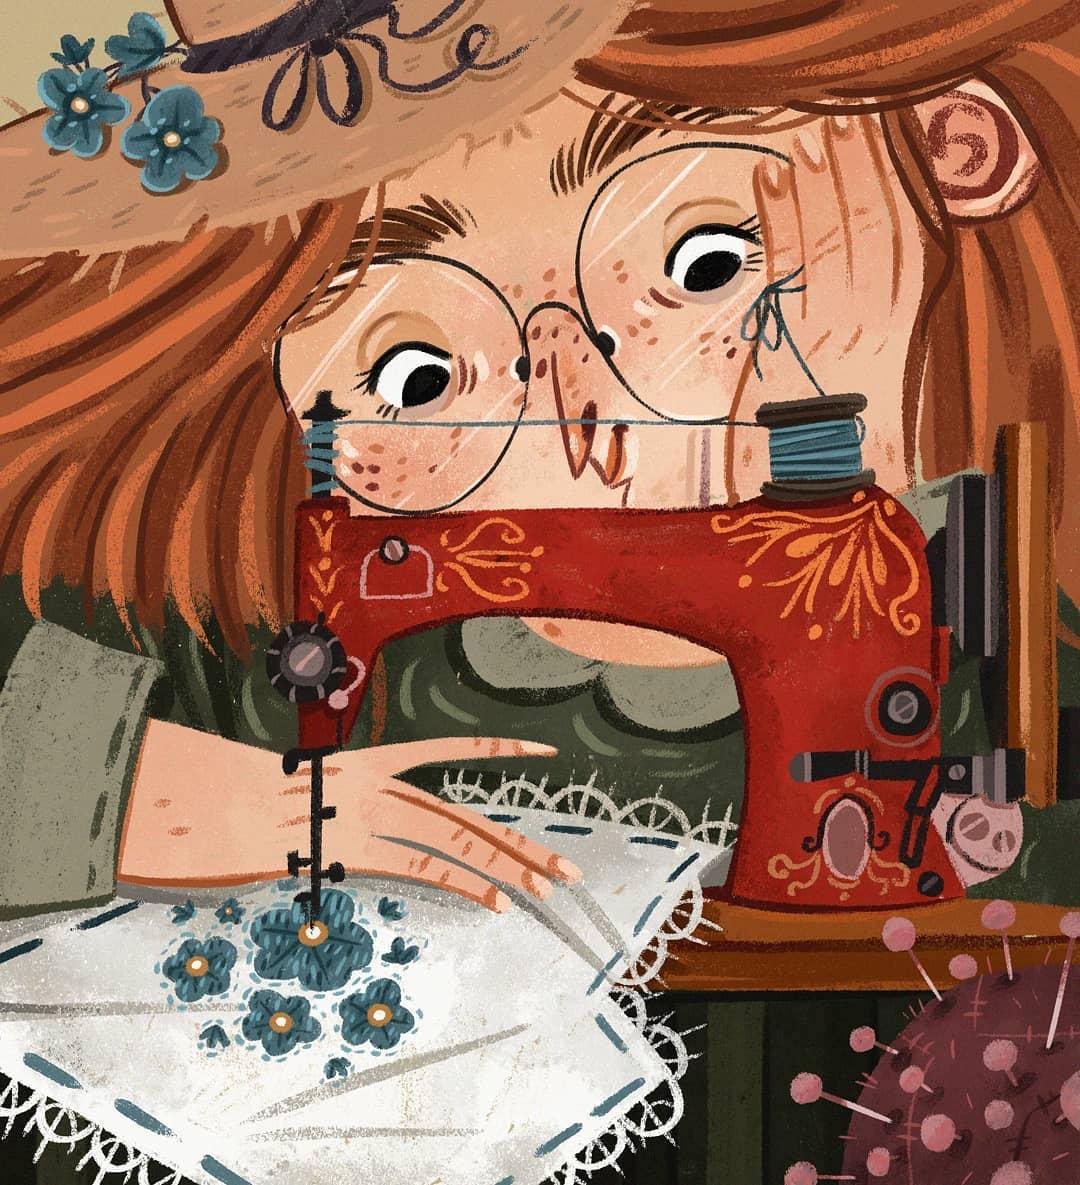 Photoshop illustration by Laura Proietti